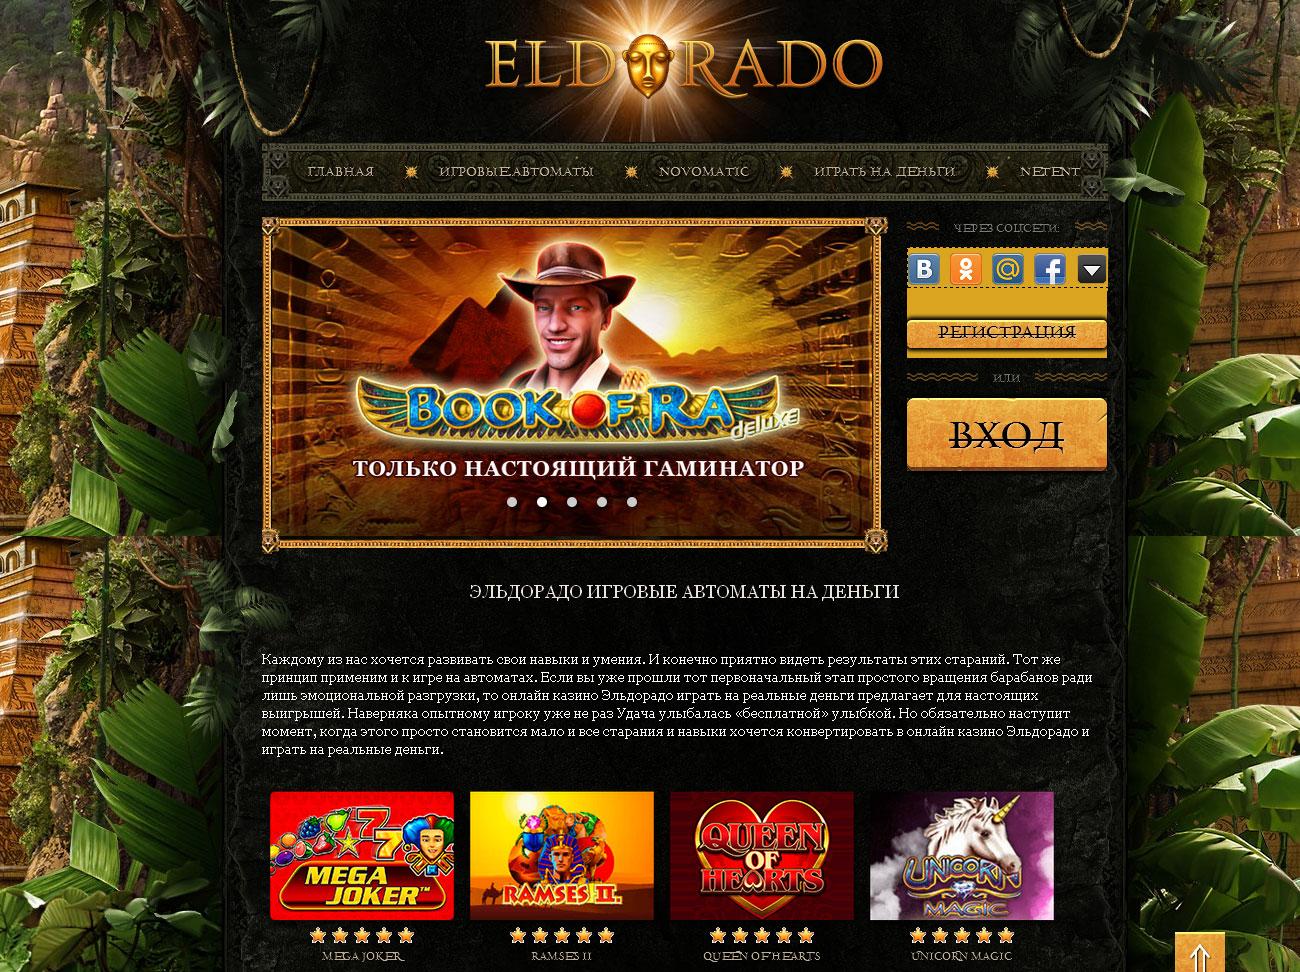 казино вулкан эльдорадо